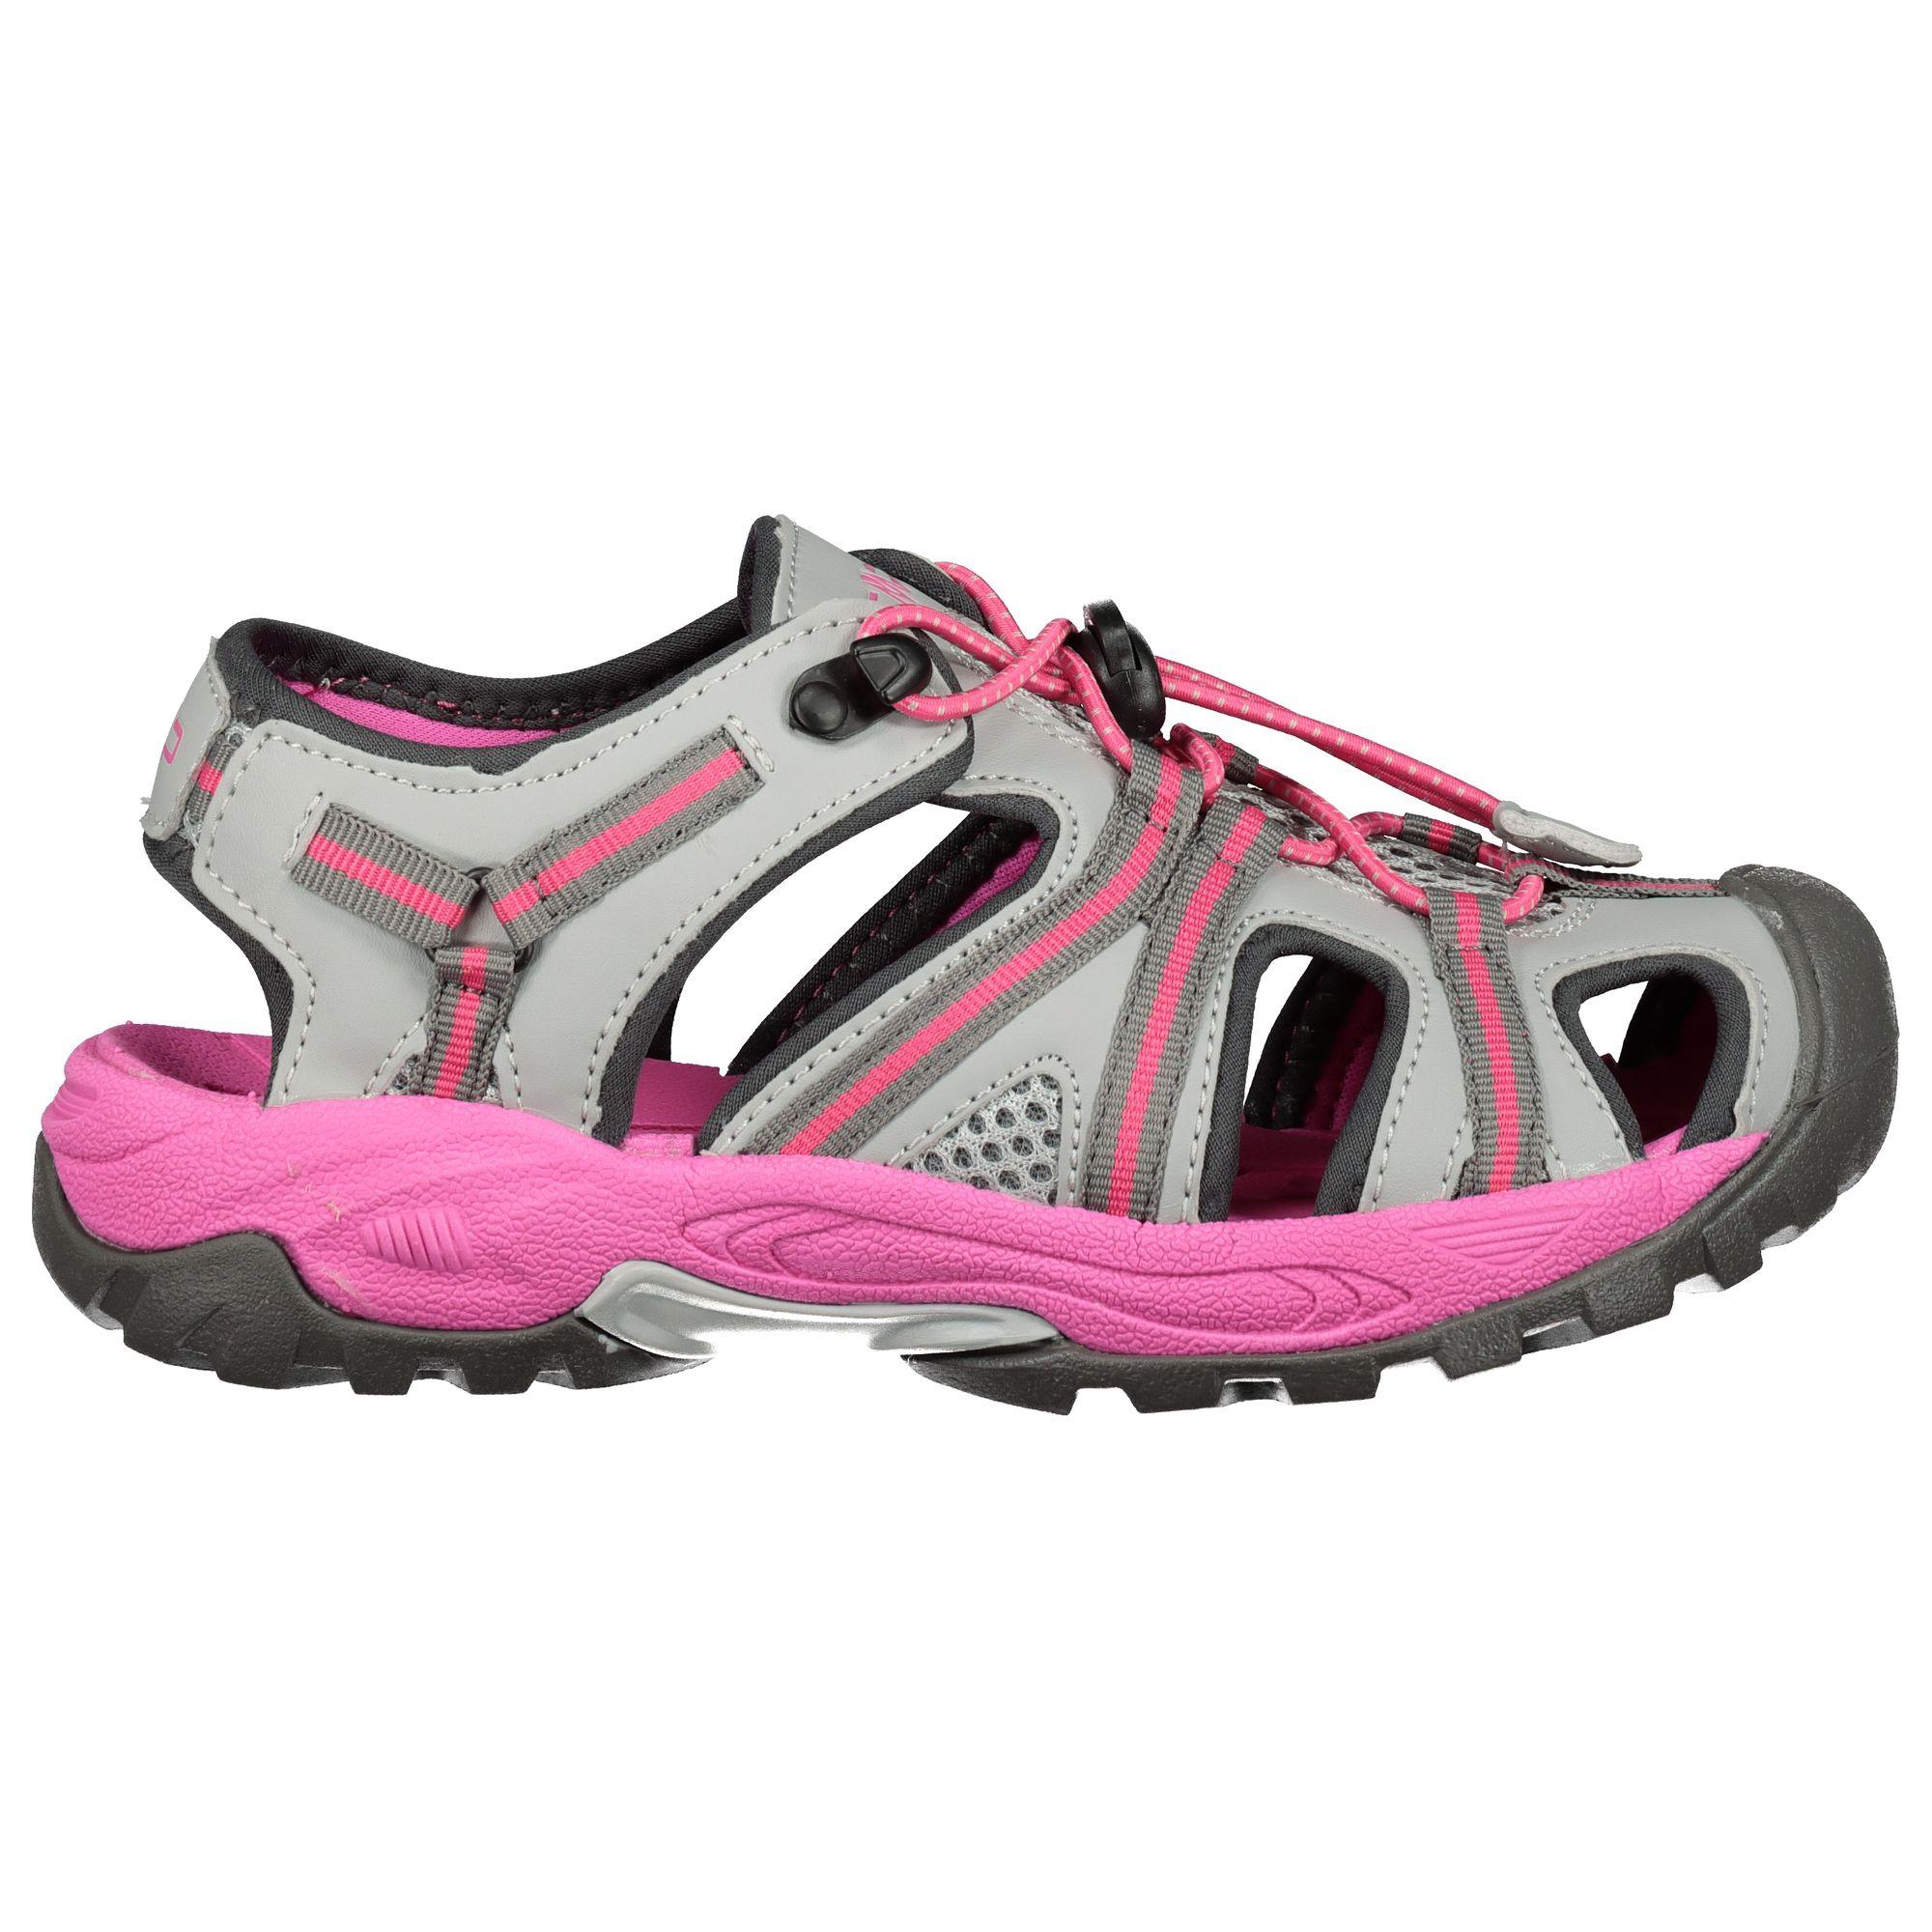 online store 75a6c 046ed CMP Kids Aquarii Hiking Sandal Geschlossene Sandalen Kinder Mädchen  ice-geraneo Kids Schuhe Freizeitschuhe